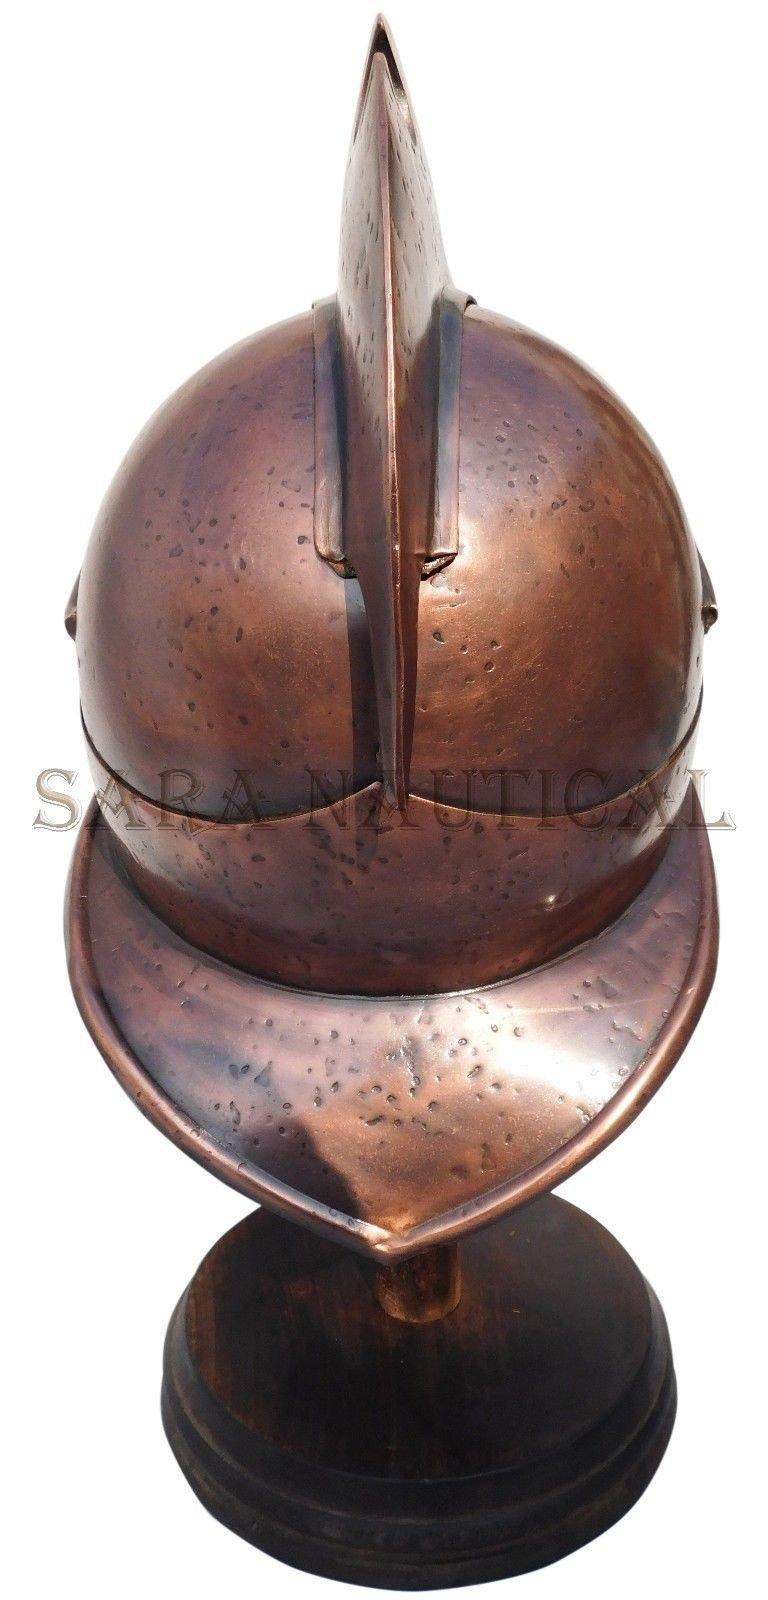 All Metal 300 Spartan Helmet Metal Collectible Decorative Antique Item Halloween Helmet by Expressions Enterprises (Image #4)